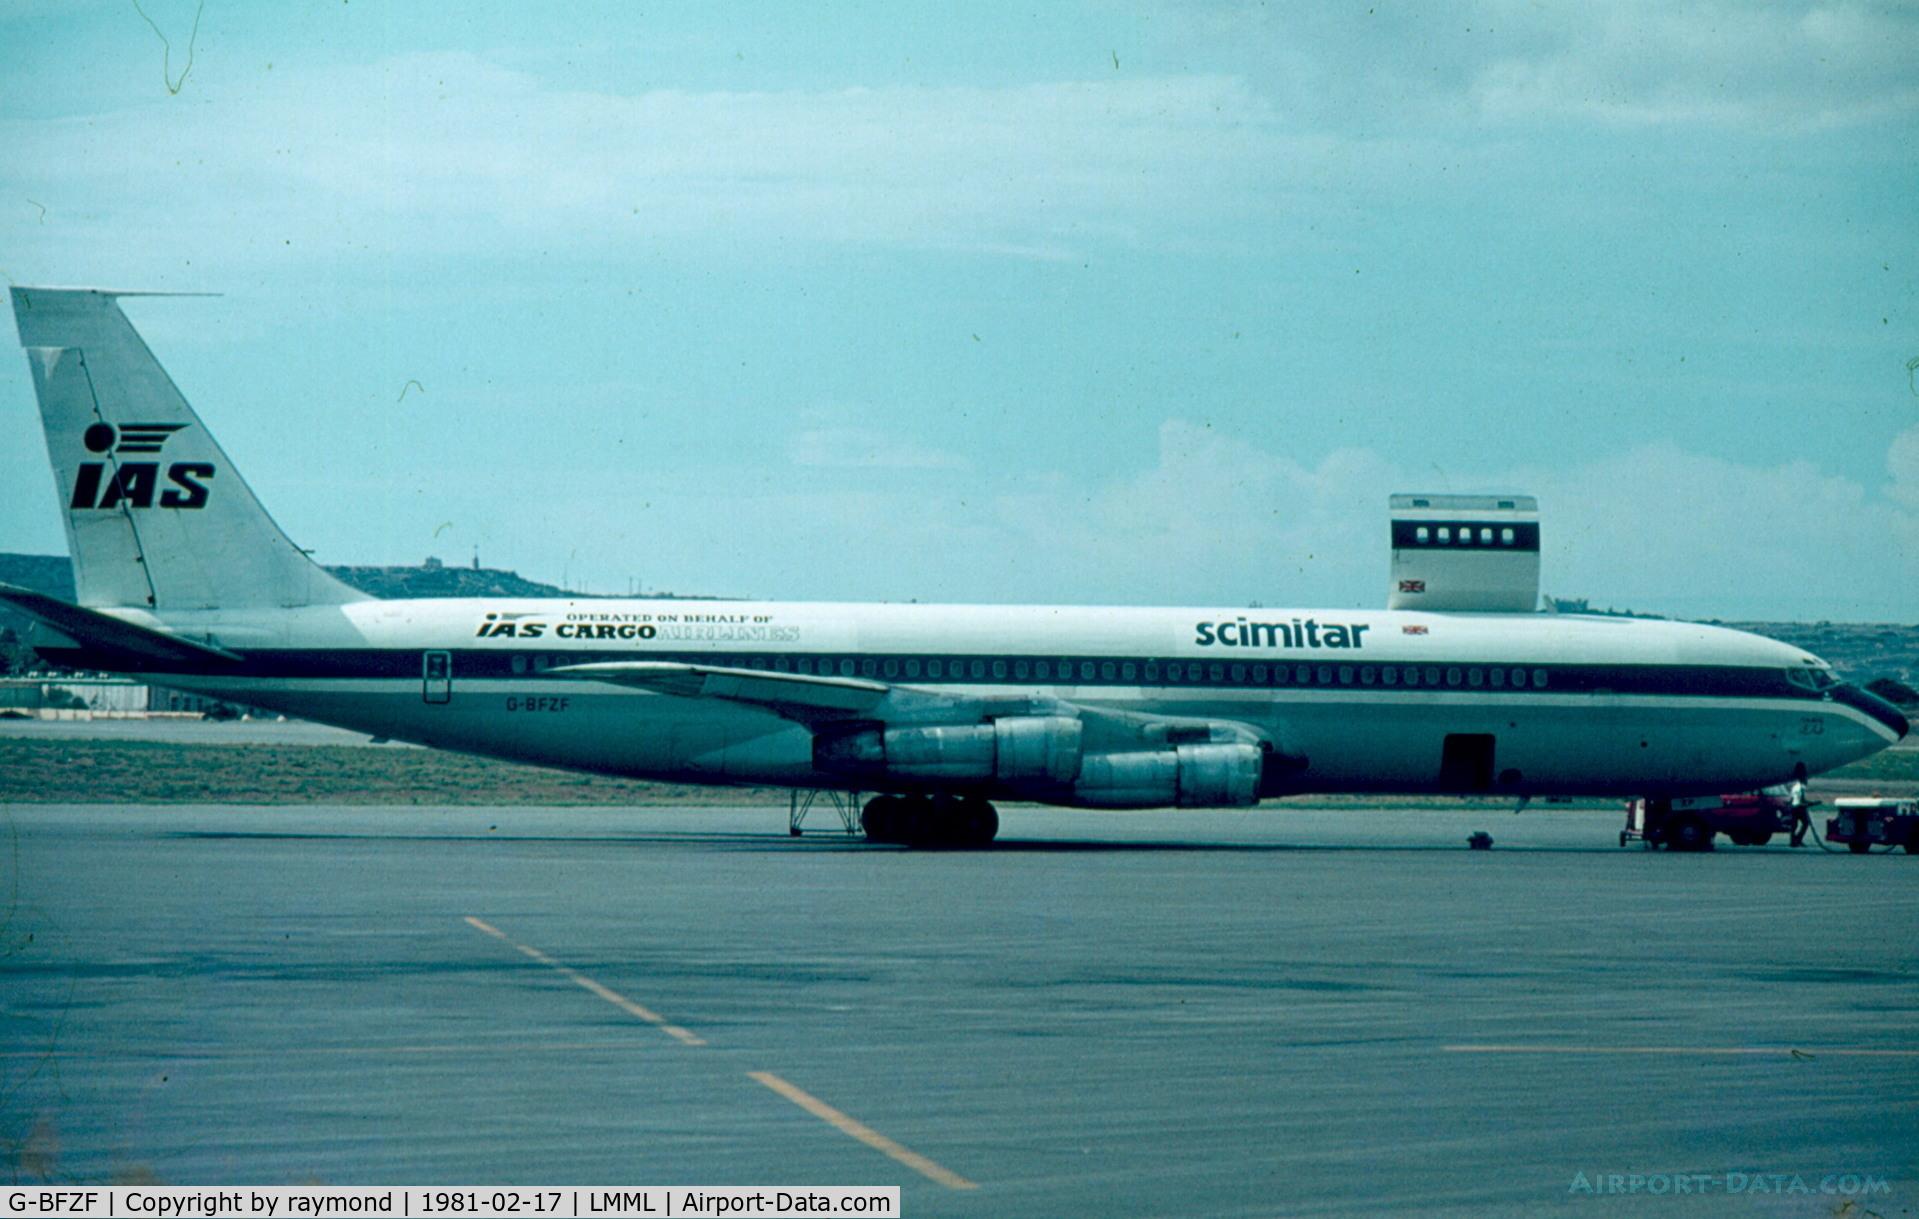 G-BFZF, 1964 Boeing 707-321C C/N 18718, B707 G-BFZF Scimitar Cargo